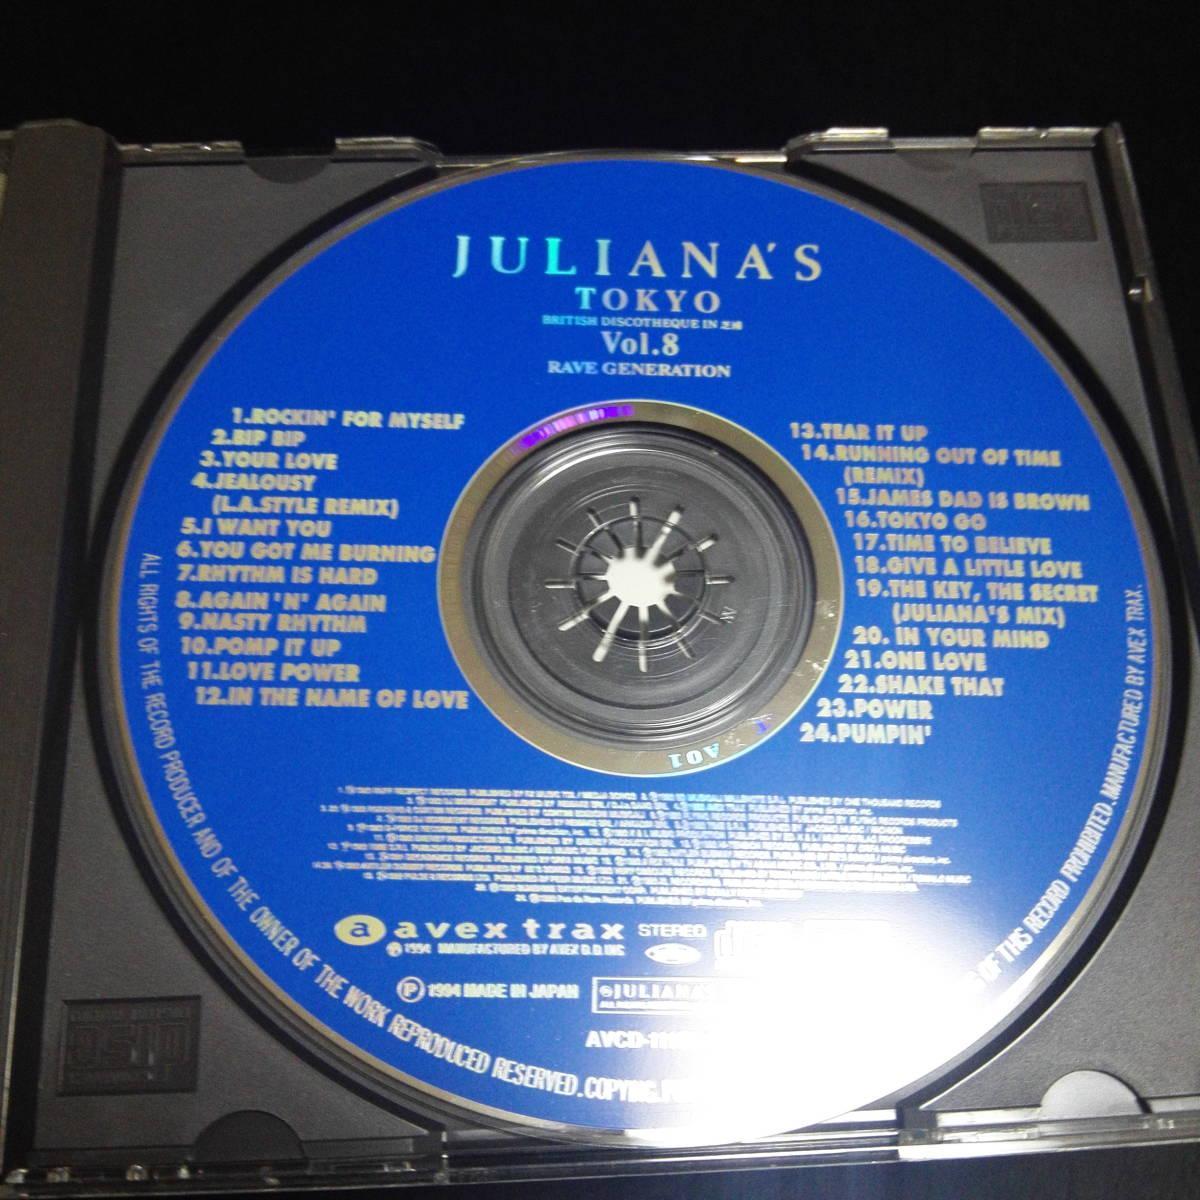 JULIANA'S TOKYO Vol.8 ジュリアナ 東京 90s ディスコ DISCO ジョンロビンソン John Robinson 2ND FUNK-TION L.A.STYLE RAVEMAN Fargetta_画像9